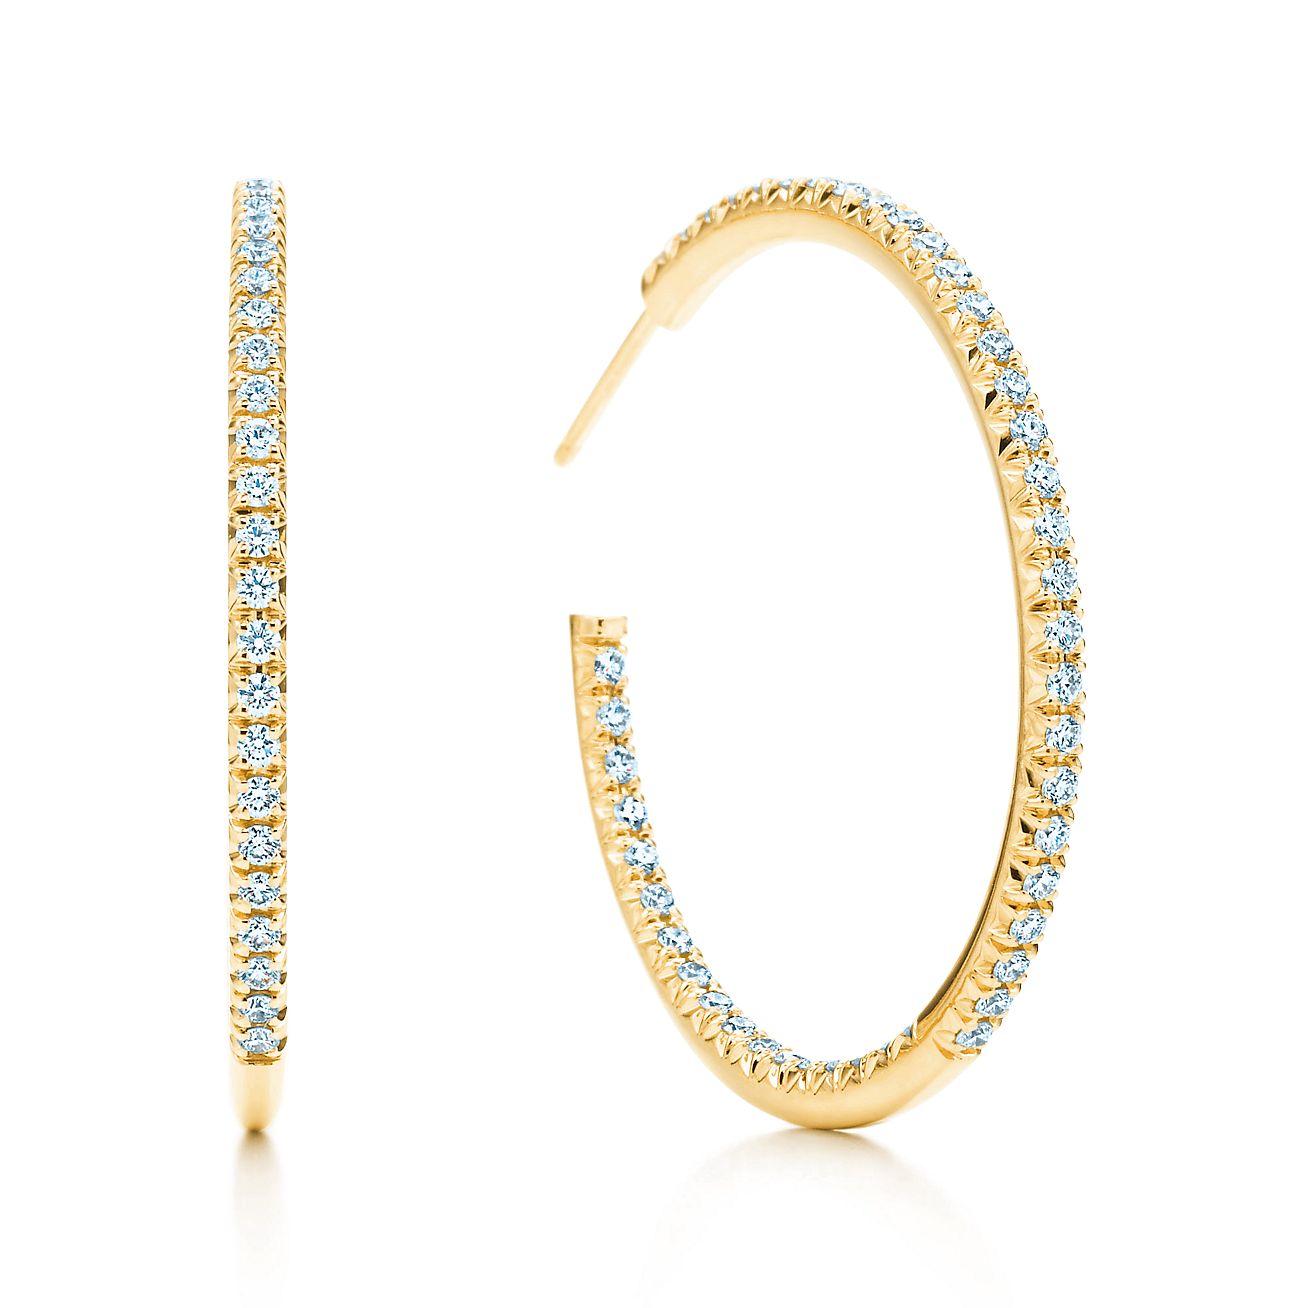 tiffany metro hoop earrings in 18k gold with diamonds